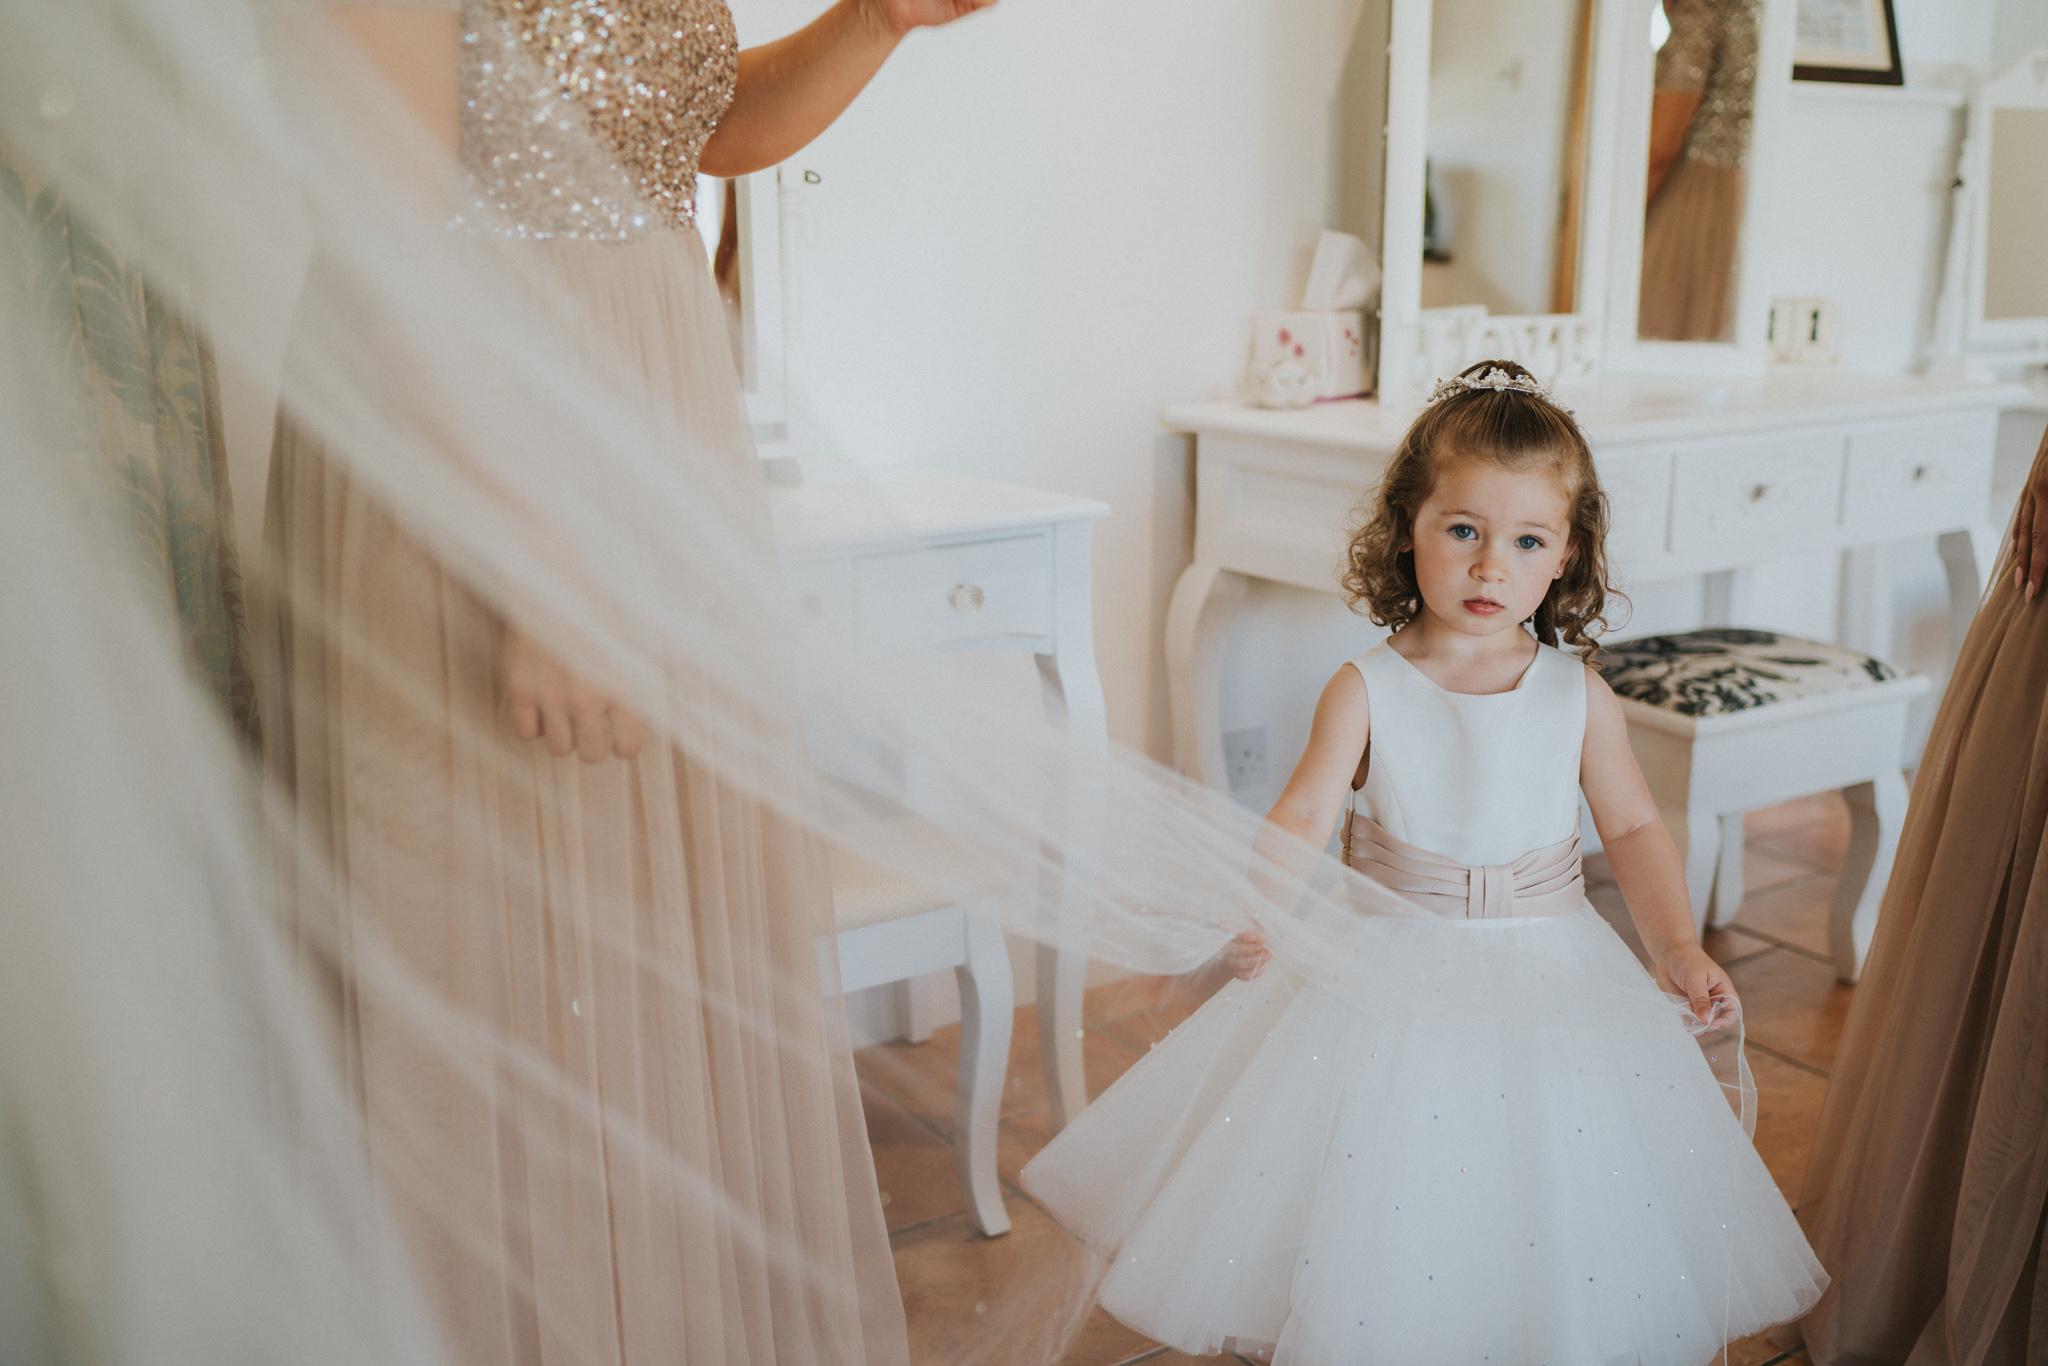 danielle-and-gareths-boho-wedding-previews-at-high-house-weddings-grace-elizabeth-colchester-essex-suffolk-norfolk-devon-alternative-wedding-and-lifestyle-photographer (18 of 76).jpg